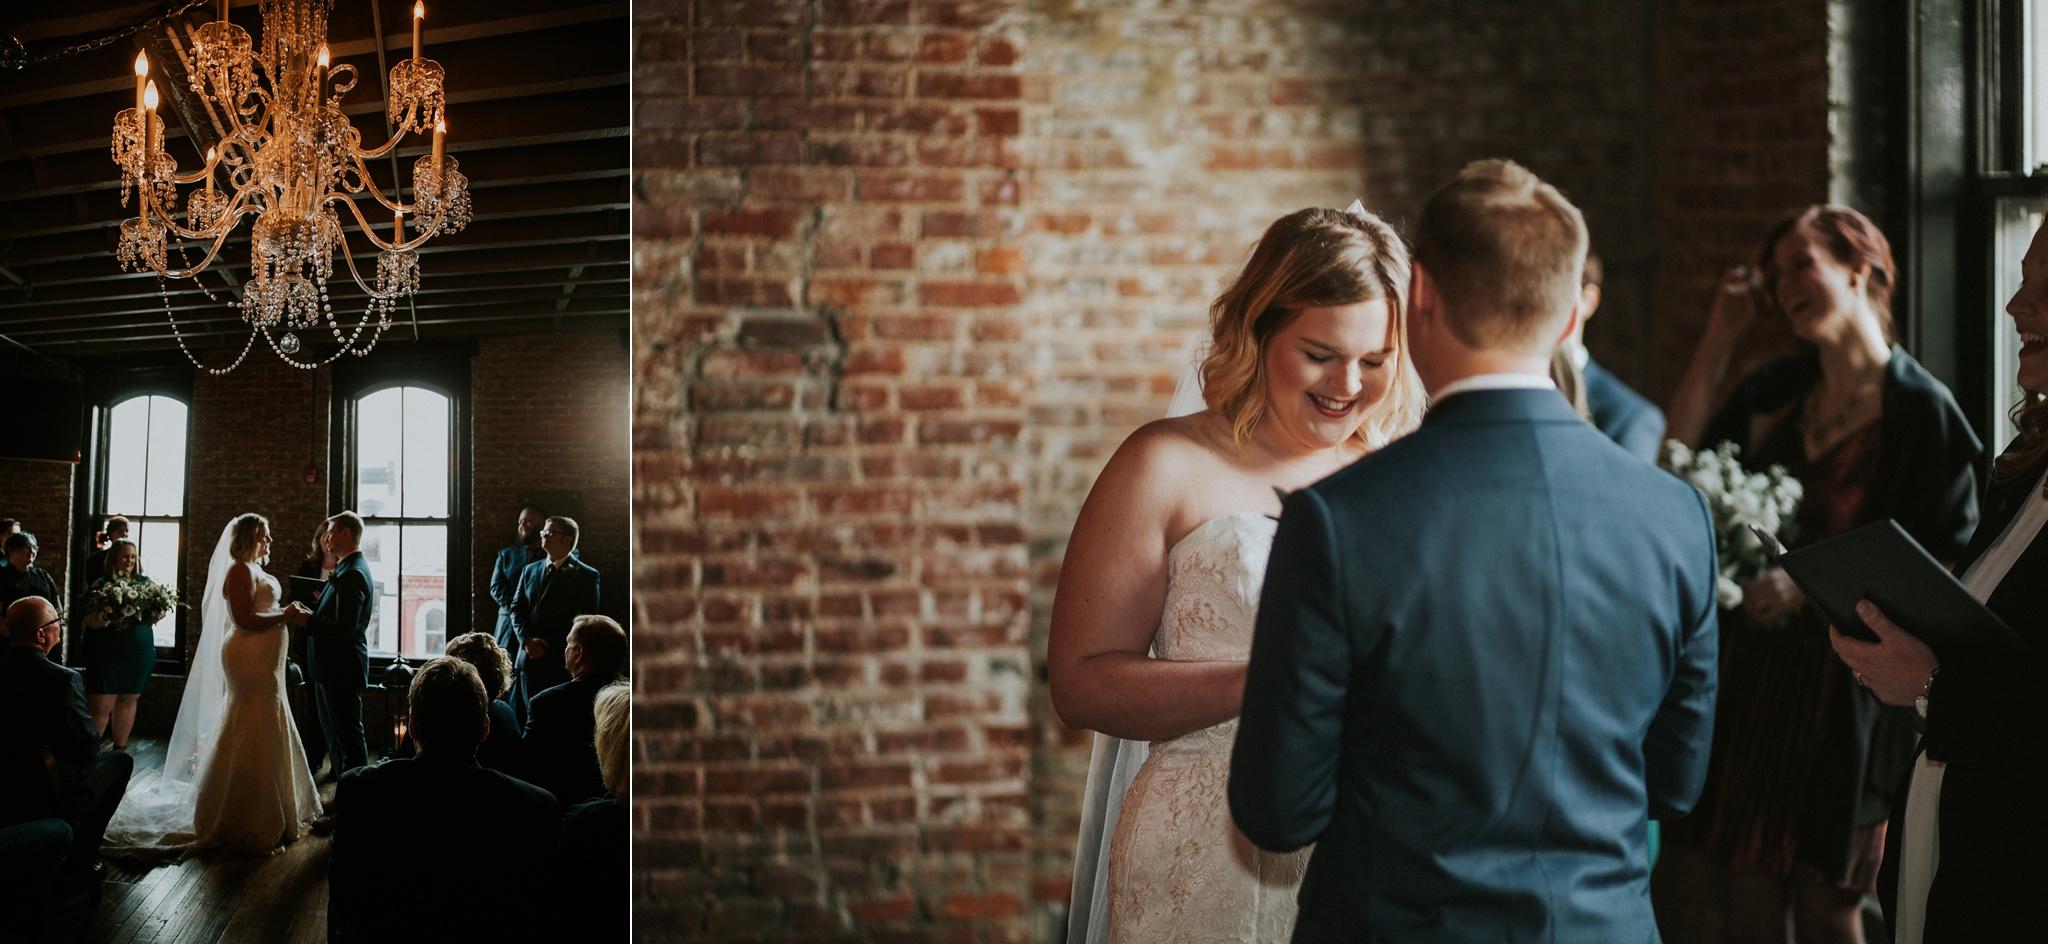 Downtown-Louisville-Surprise-Wedding_0033.jpg